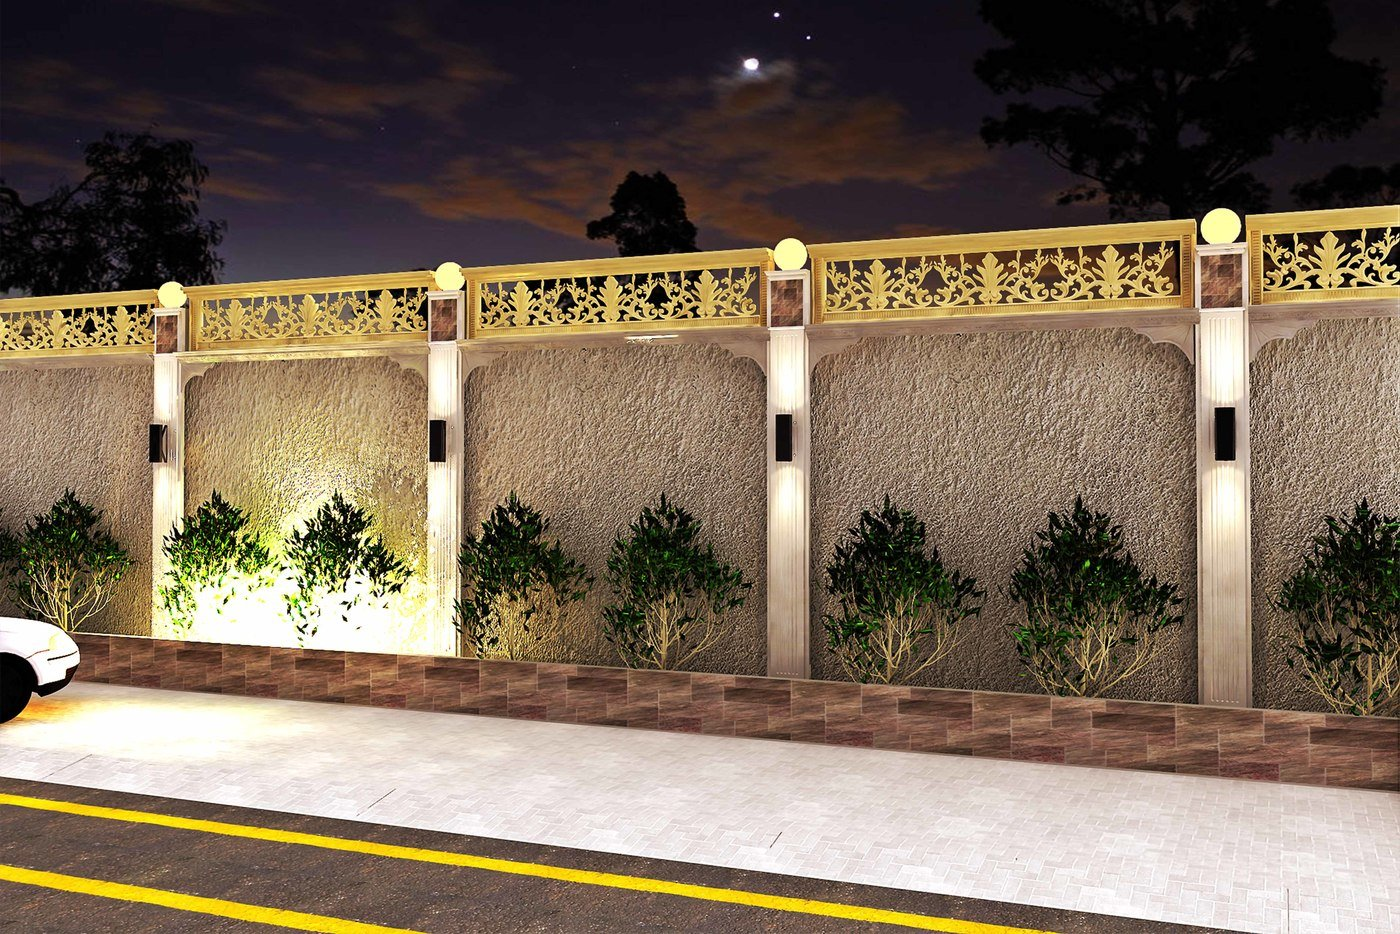 Boundary Wall Design By Israr Ahmed At Coroflot Com